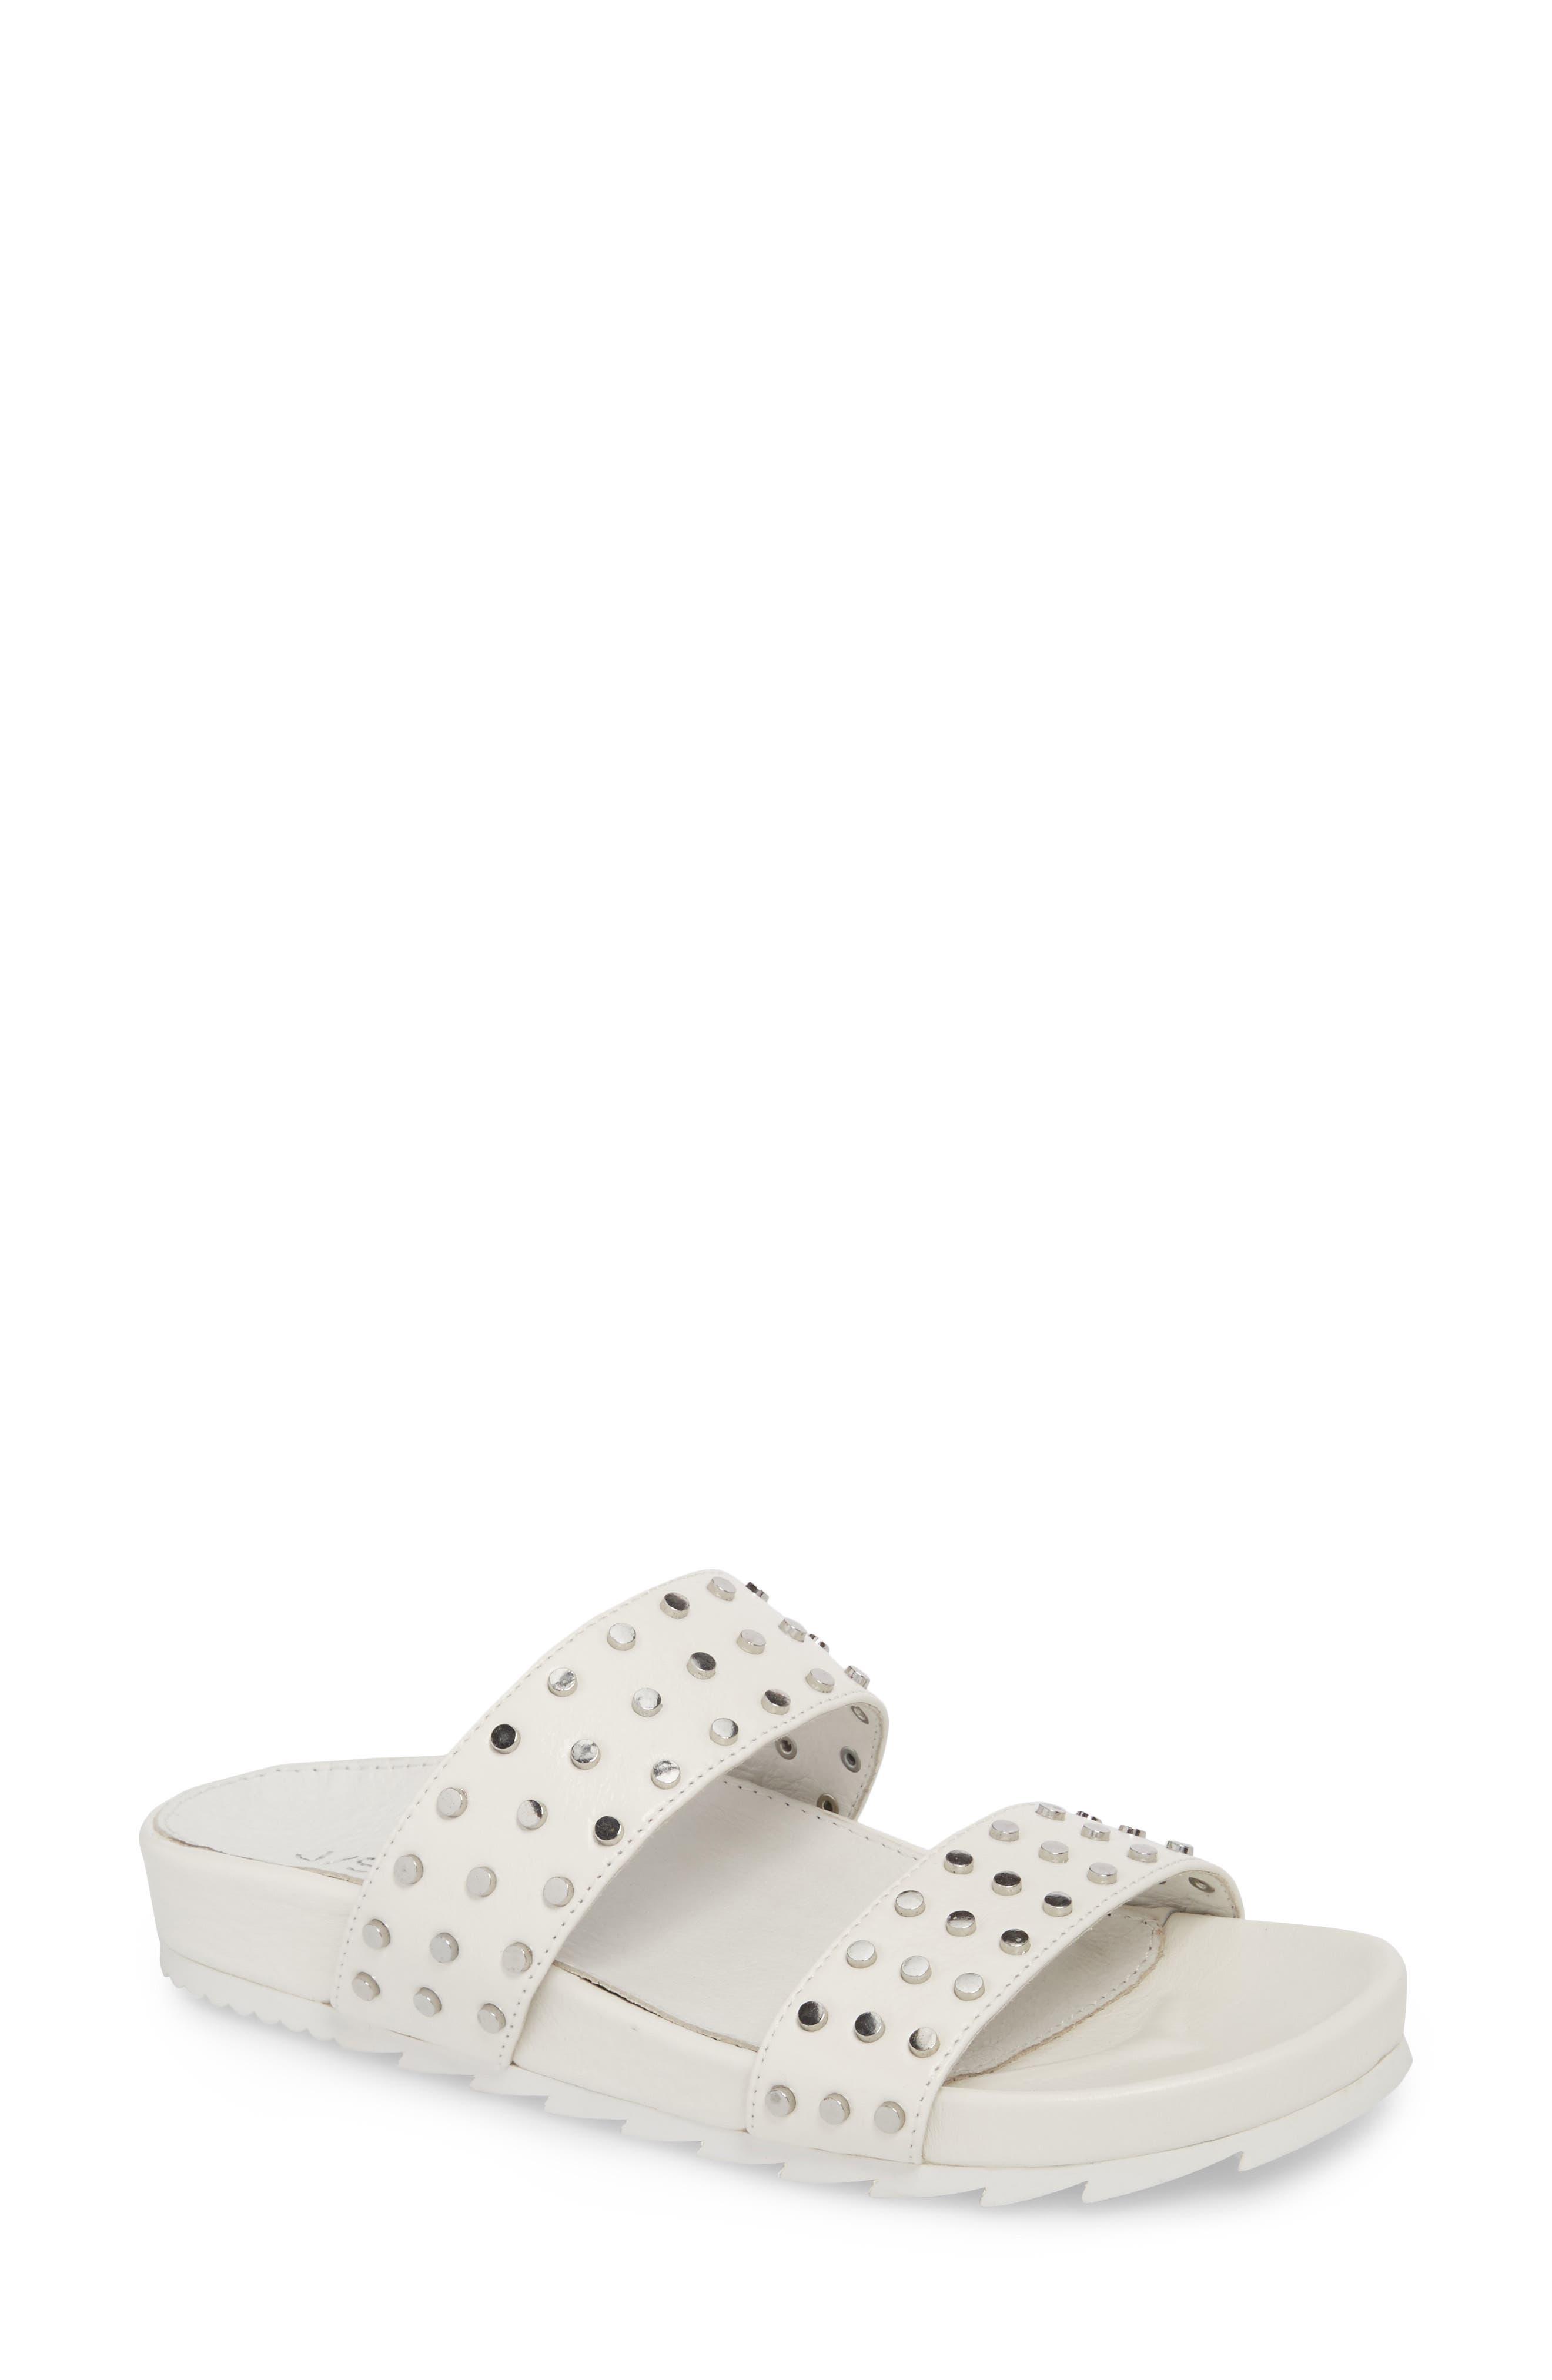 Erika Studded Slide Sandal,                             Main thumbnail 1, color,                             WHITE LEATHER